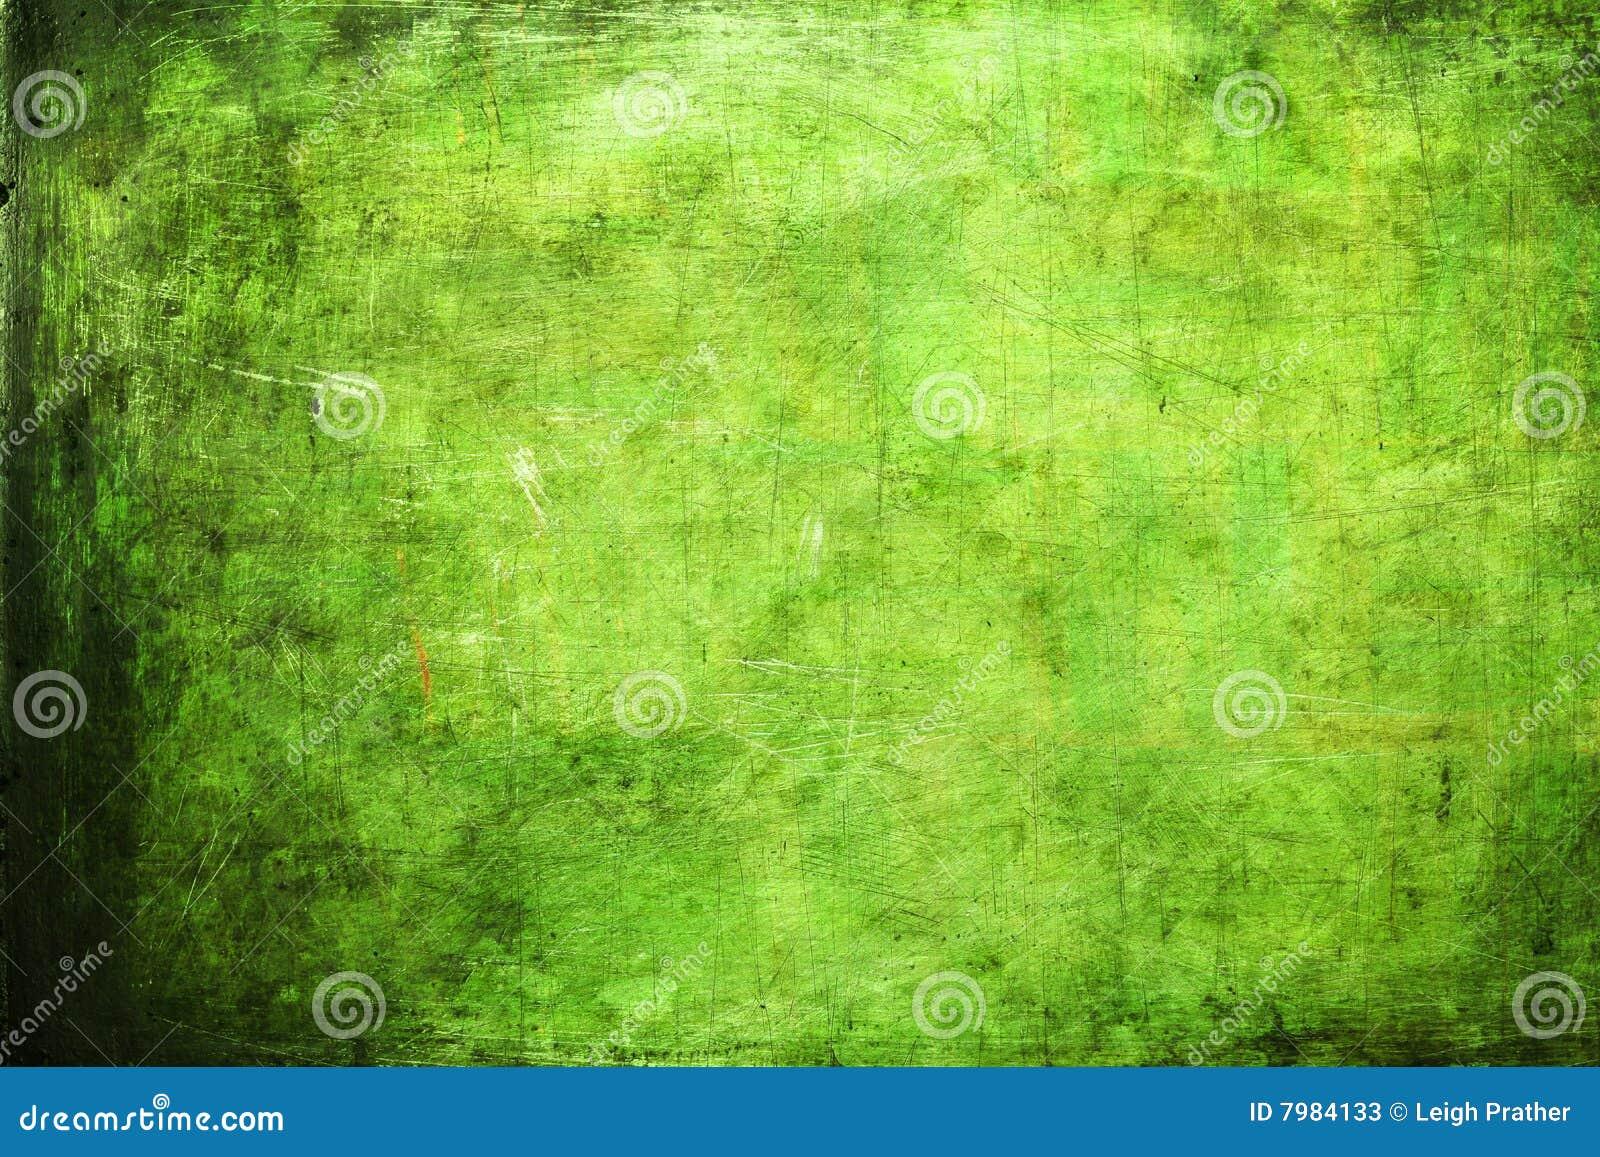 green grunge texture thumb - photo #42